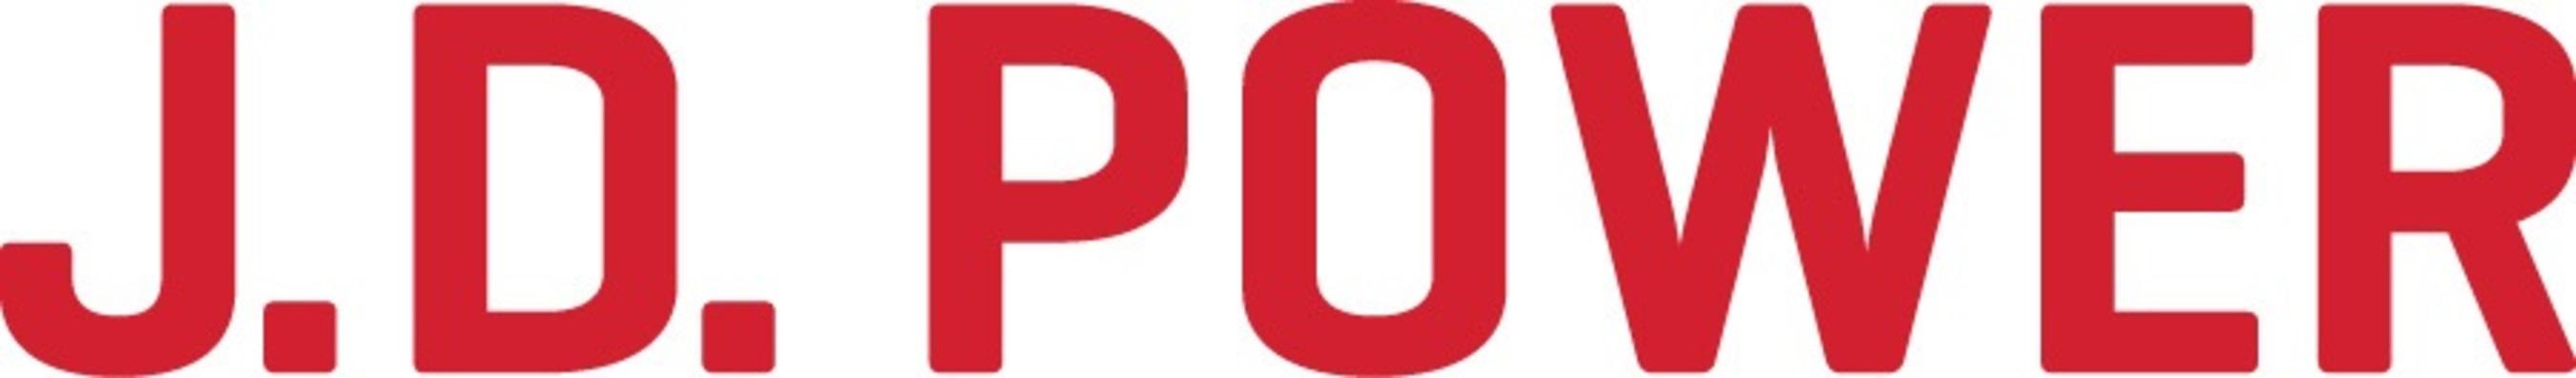 J.D. Power corporate logo